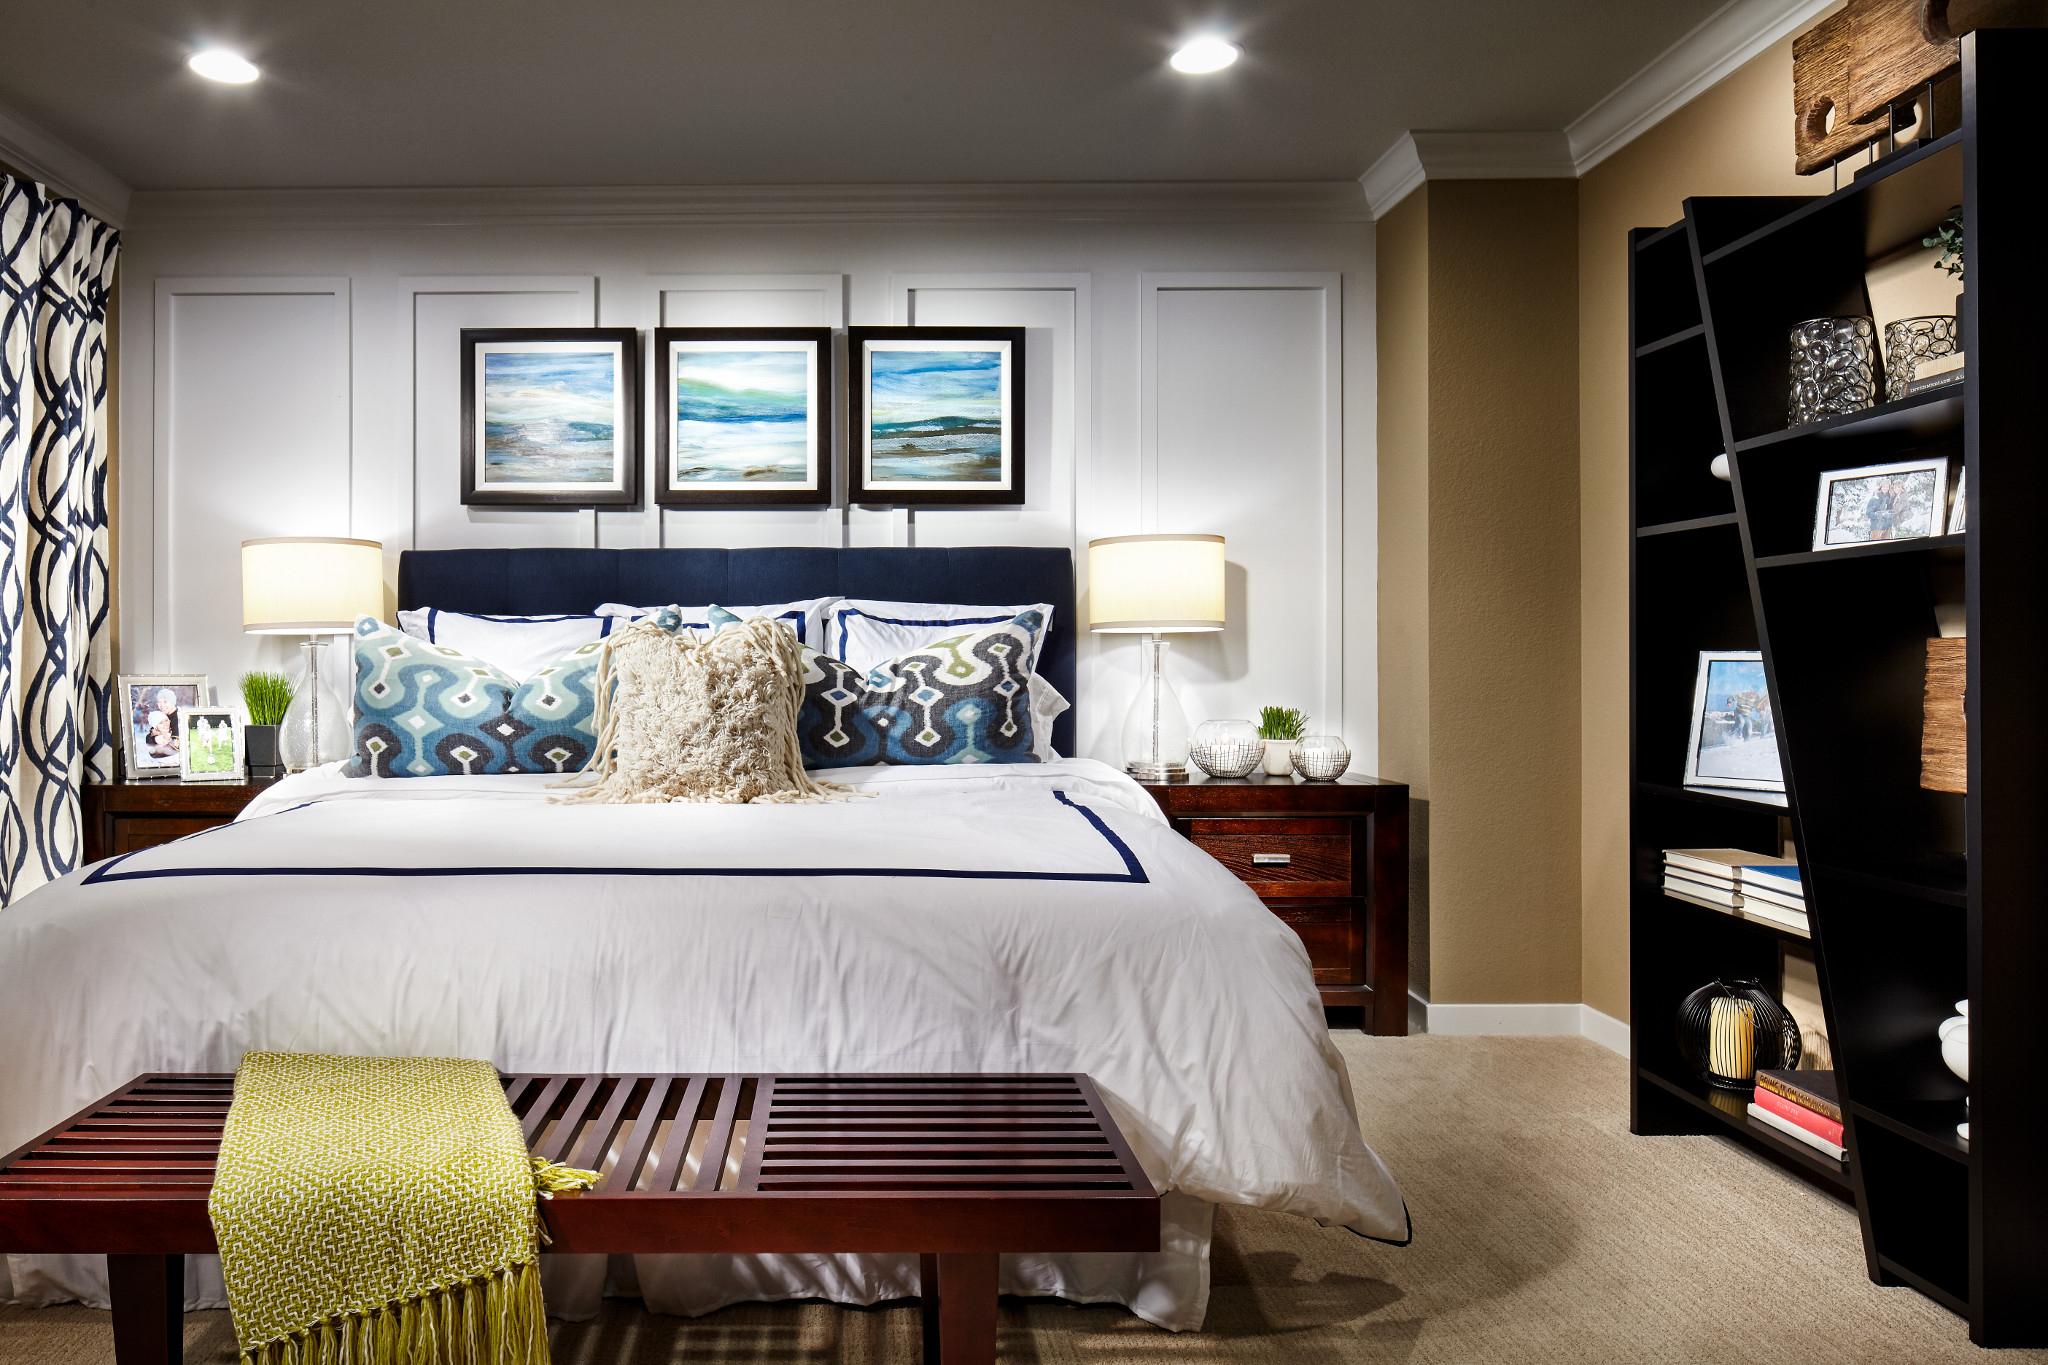 SPACES Reunion Plan 3507 Master Bedroom